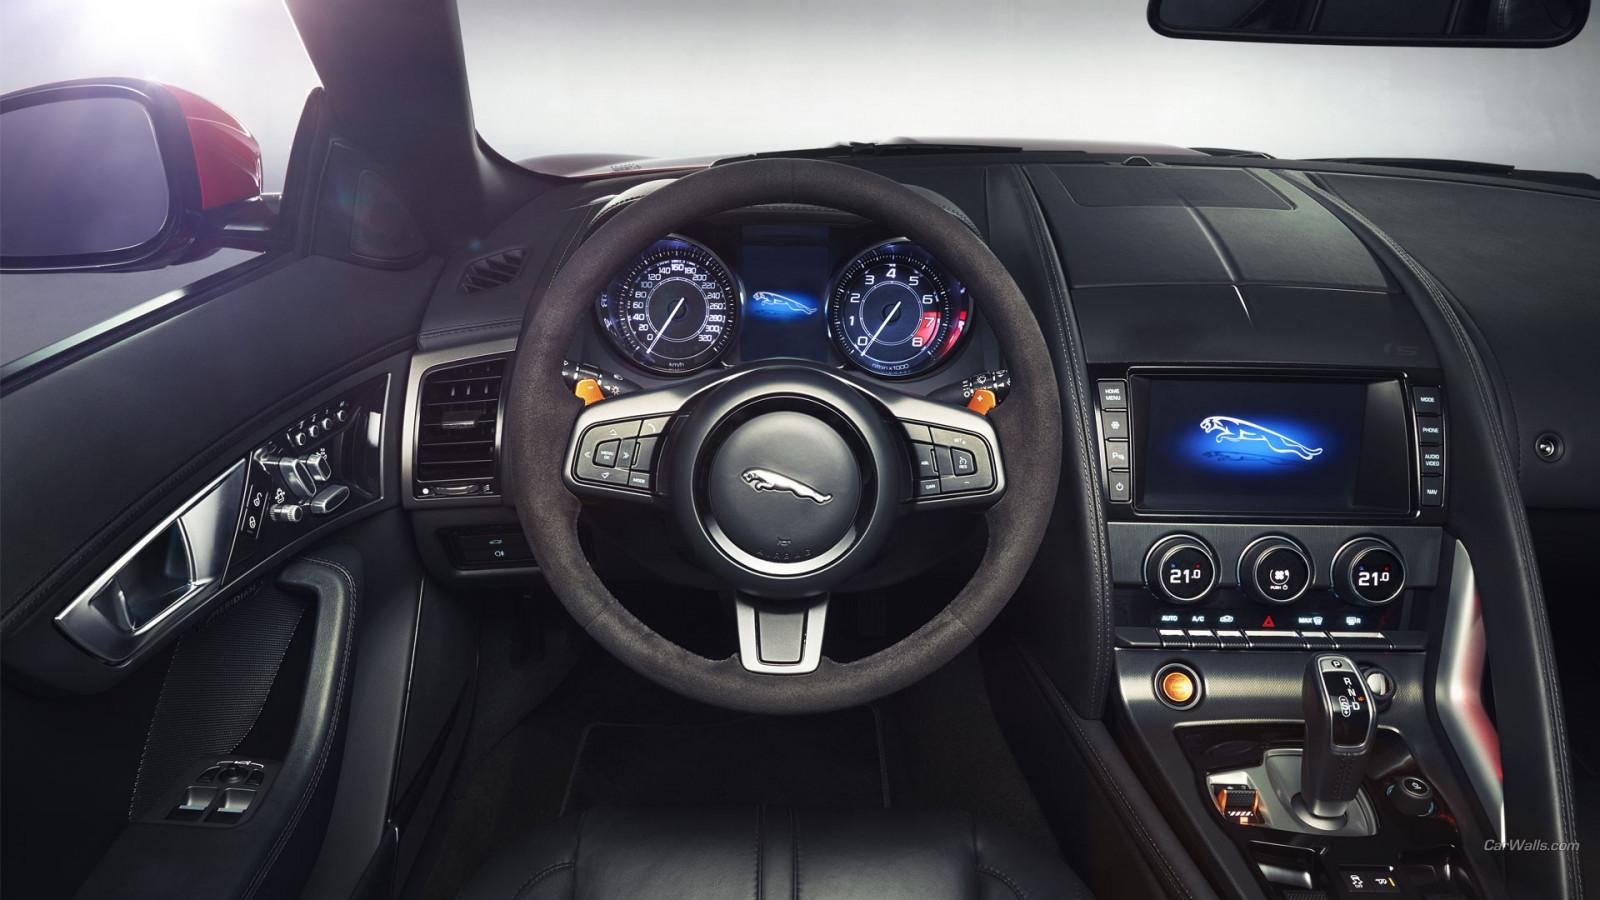 Wallpaper Car Interior Sports Car Jaguar Car Jaguar F Type